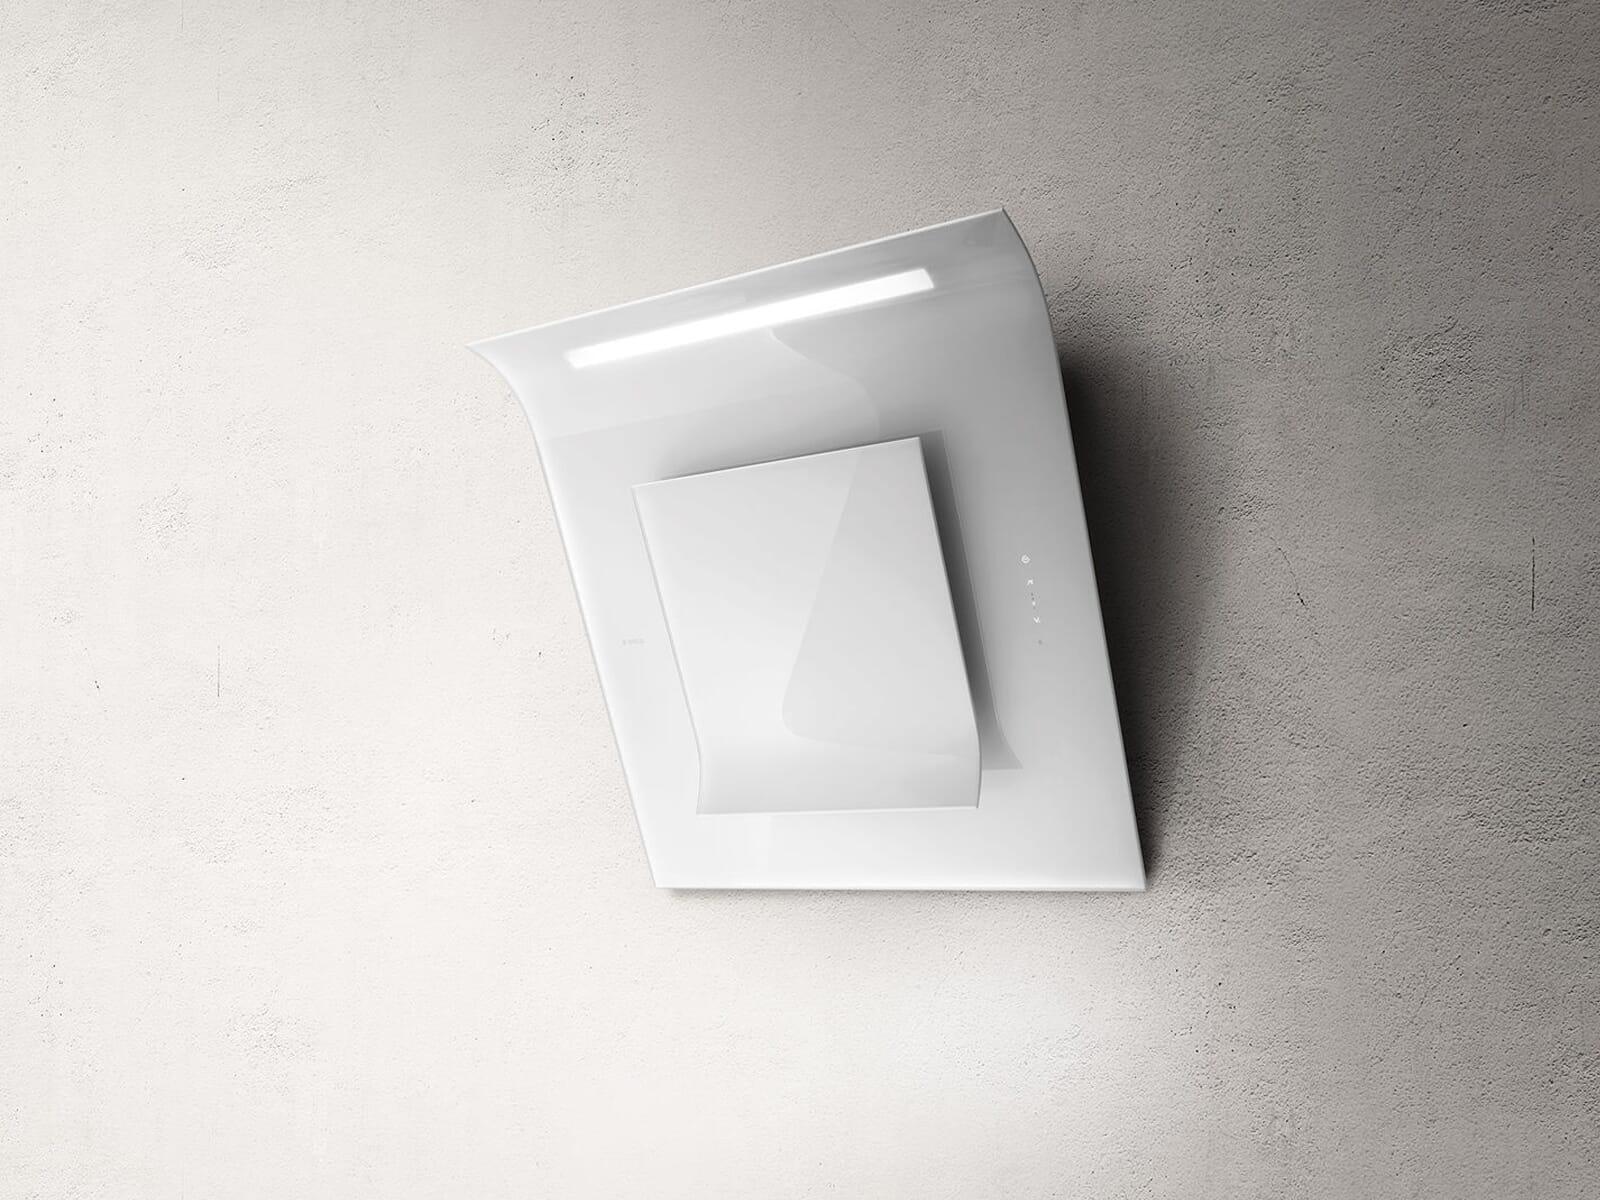 Elica Sinfonia PRF0010418B Kopffreihaube Weißes Glas